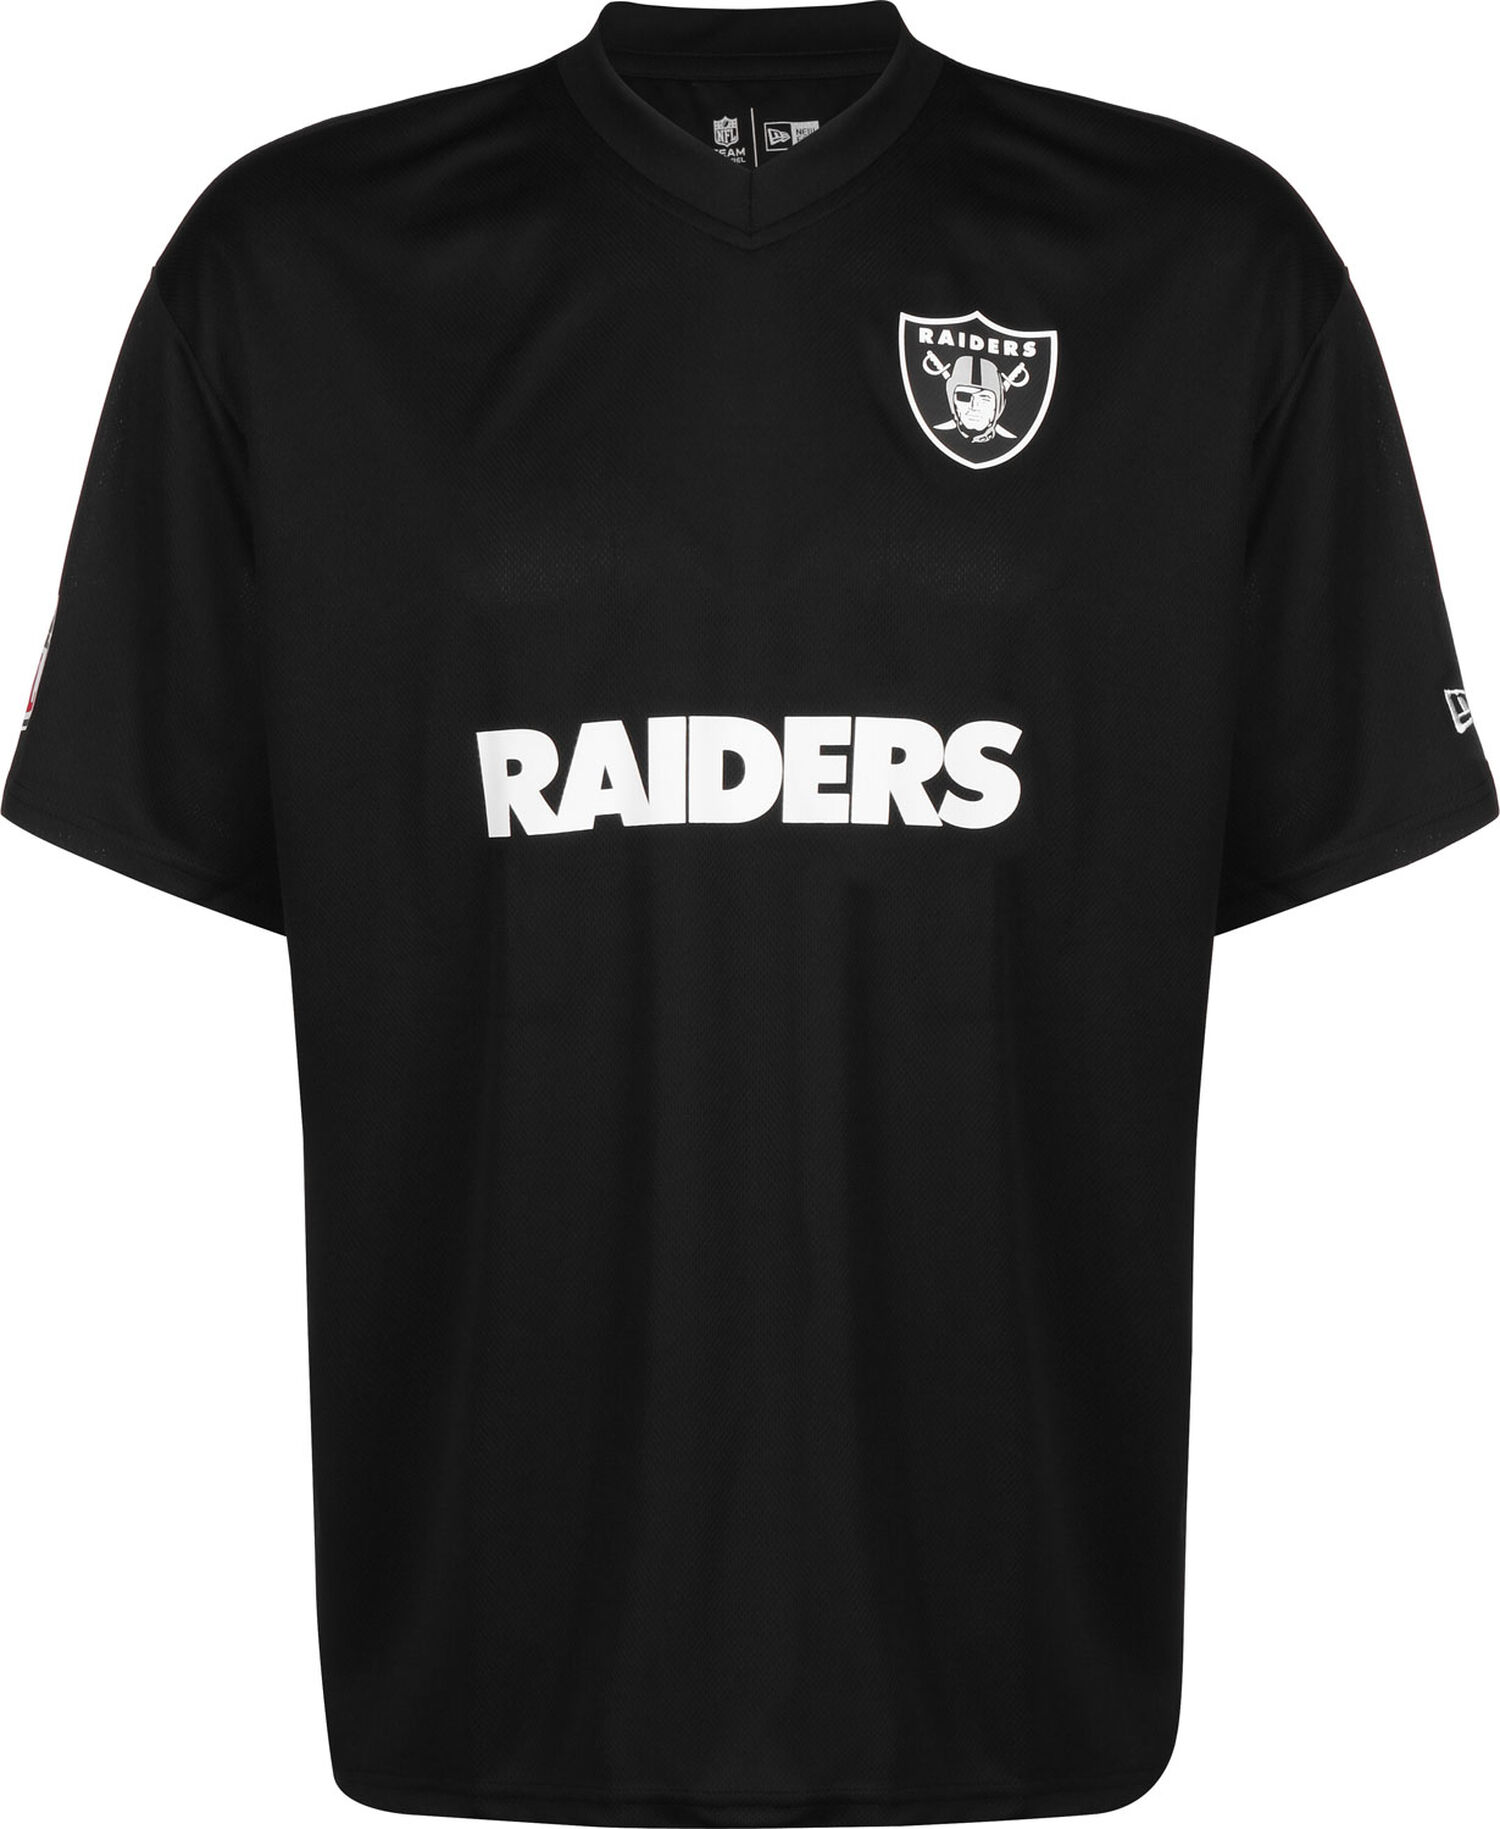 NFL Wordmark Oversized Oakland Raiders